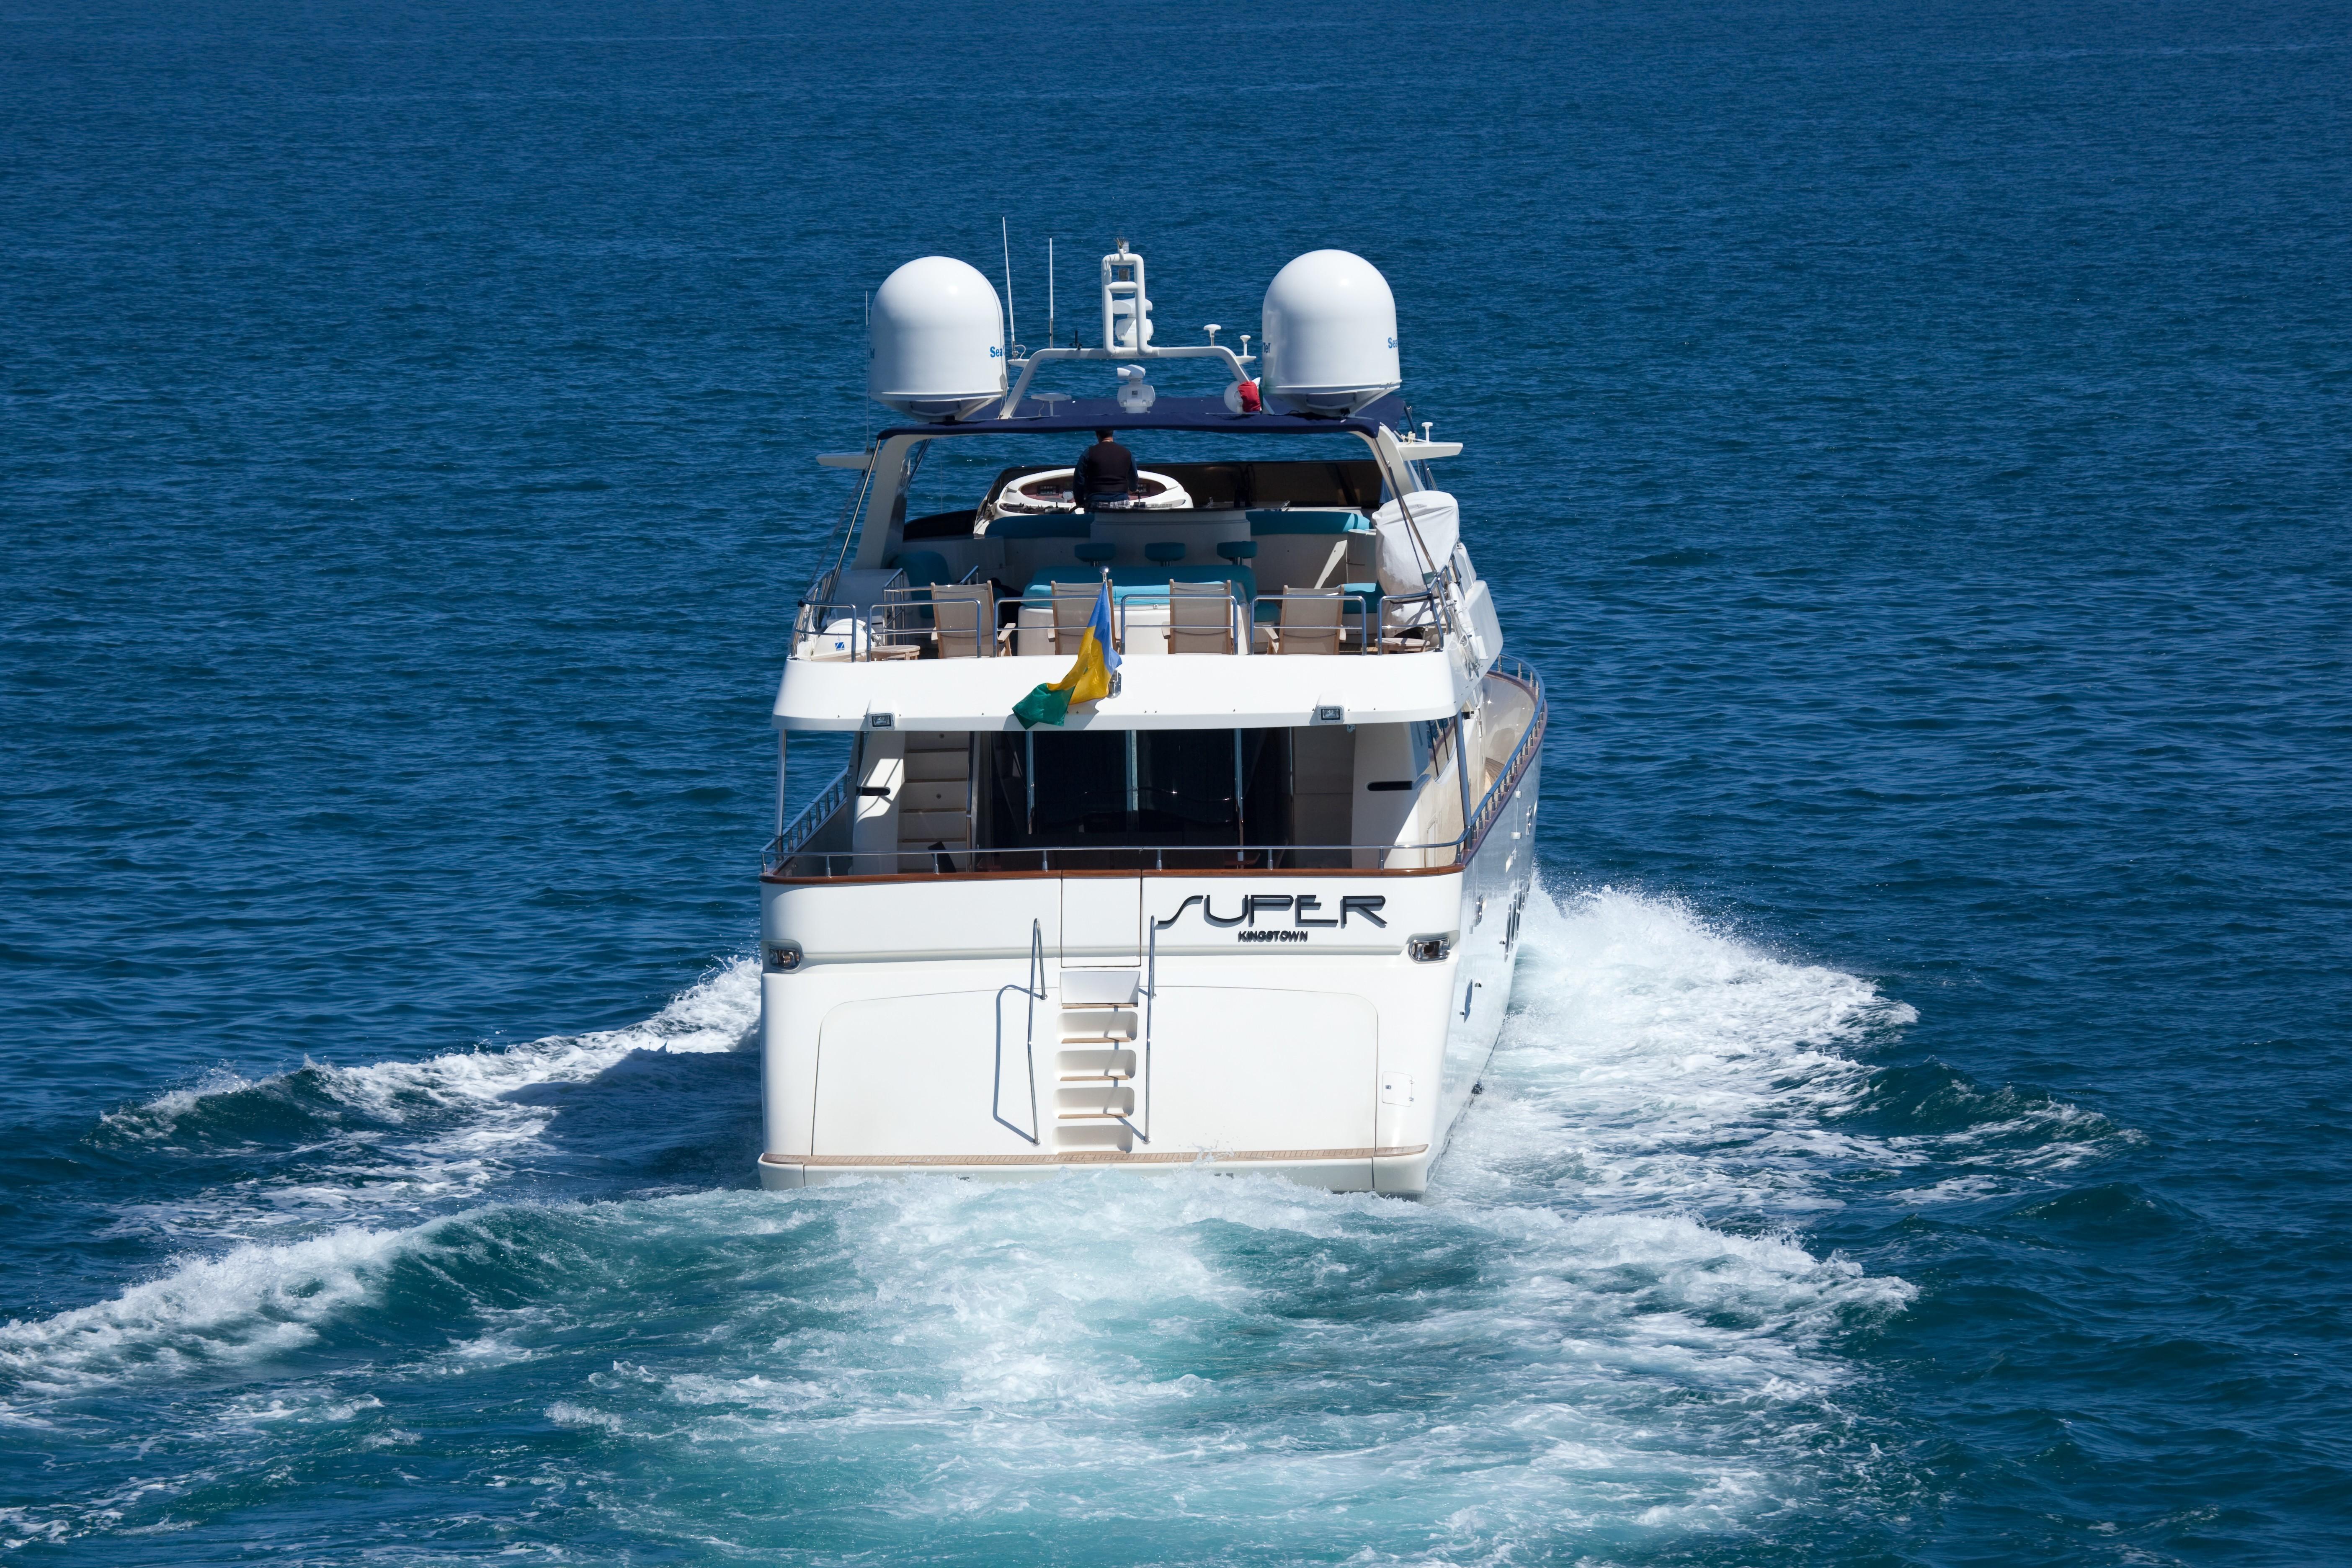 The 30m Yacht SUPER